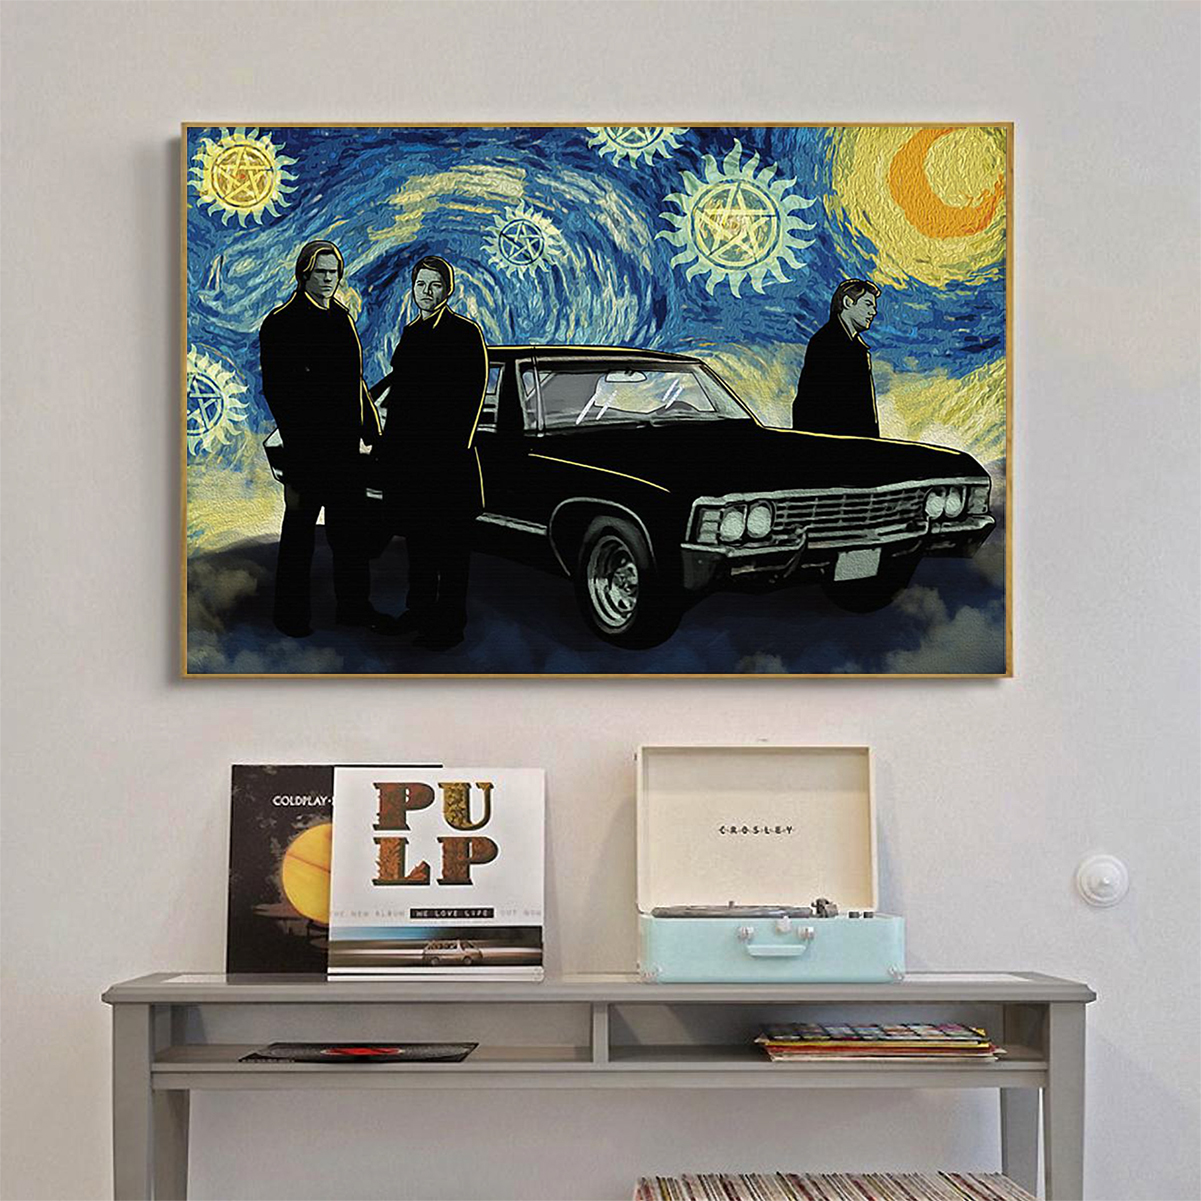 Supernatural starry night van gogh poster A1